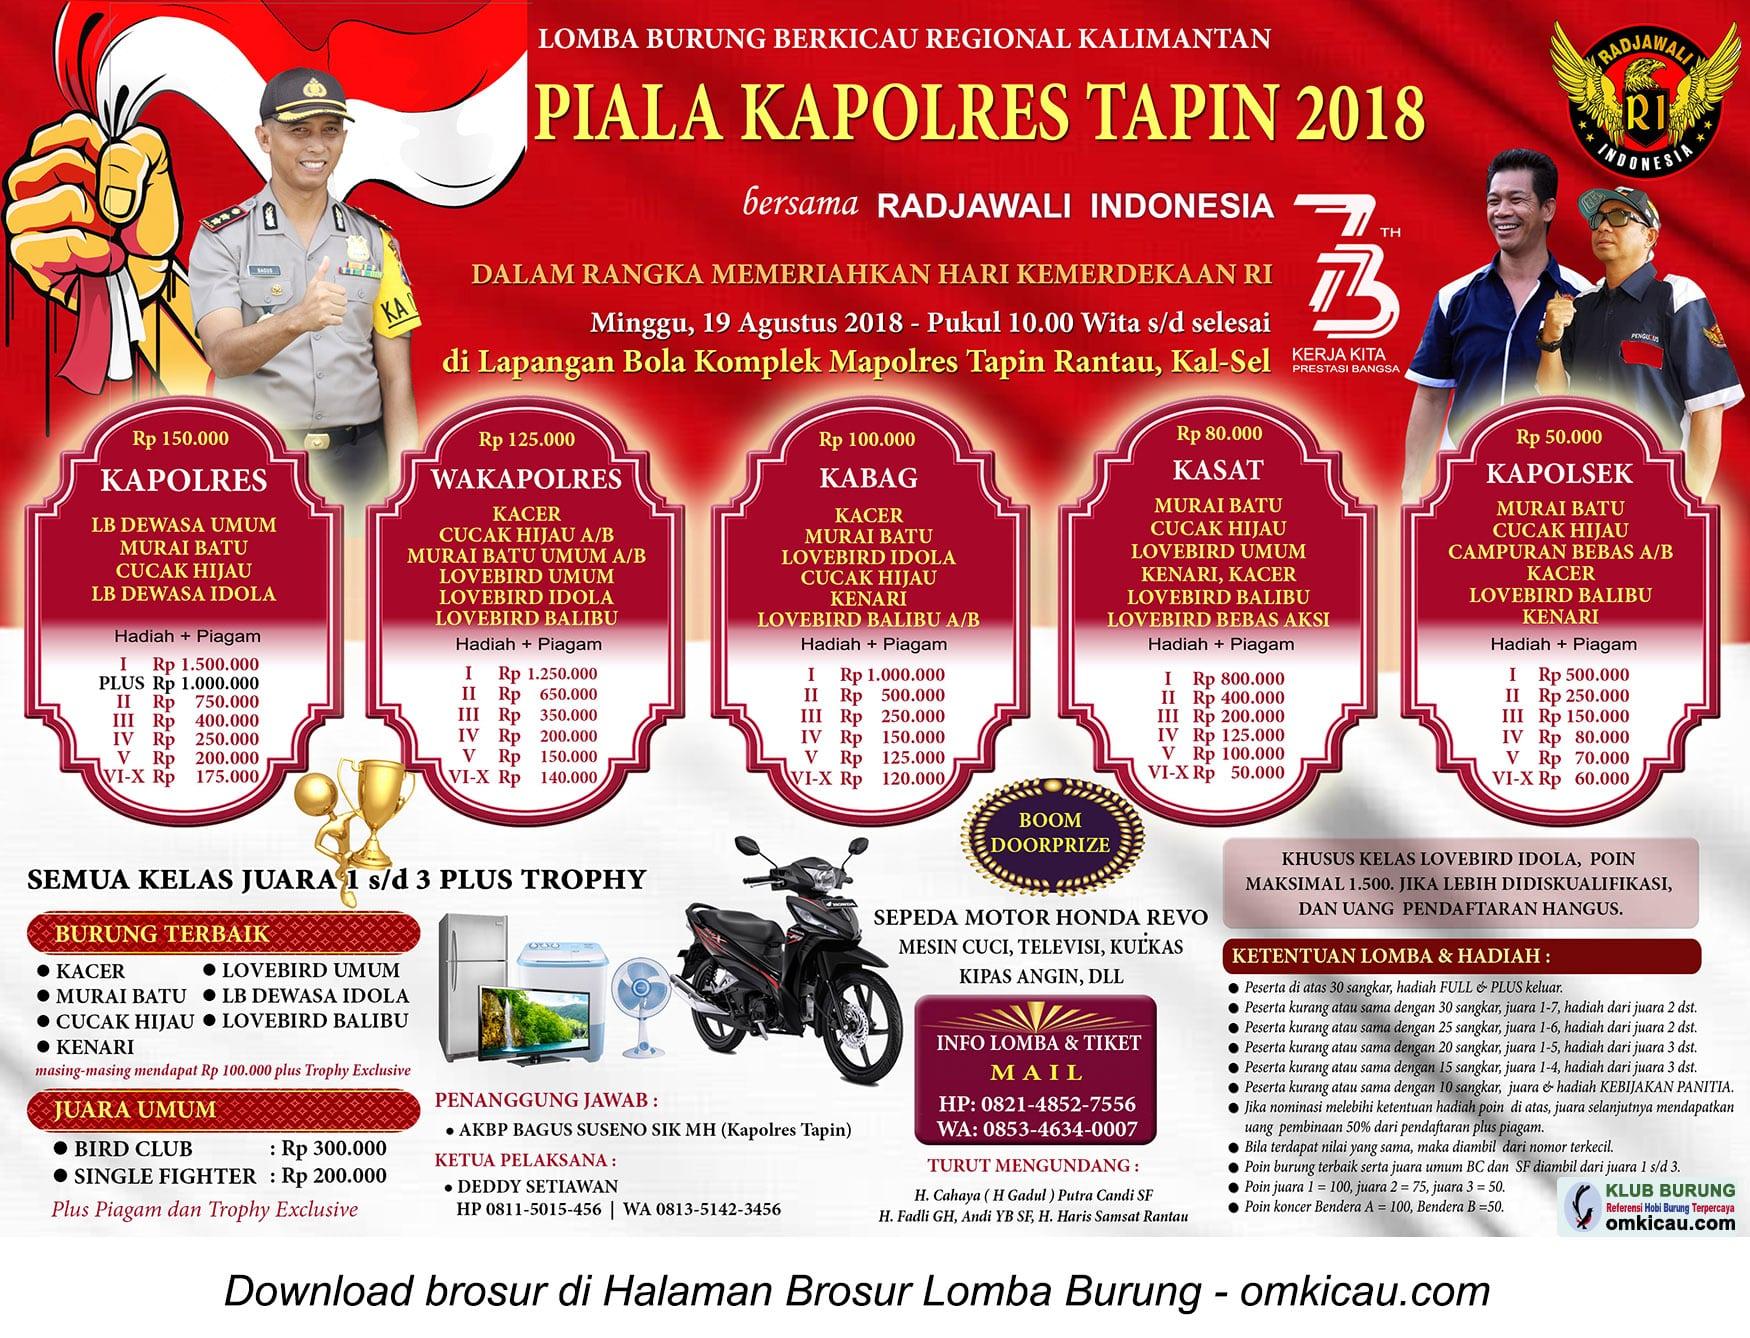 Piala Kapolres Tapin